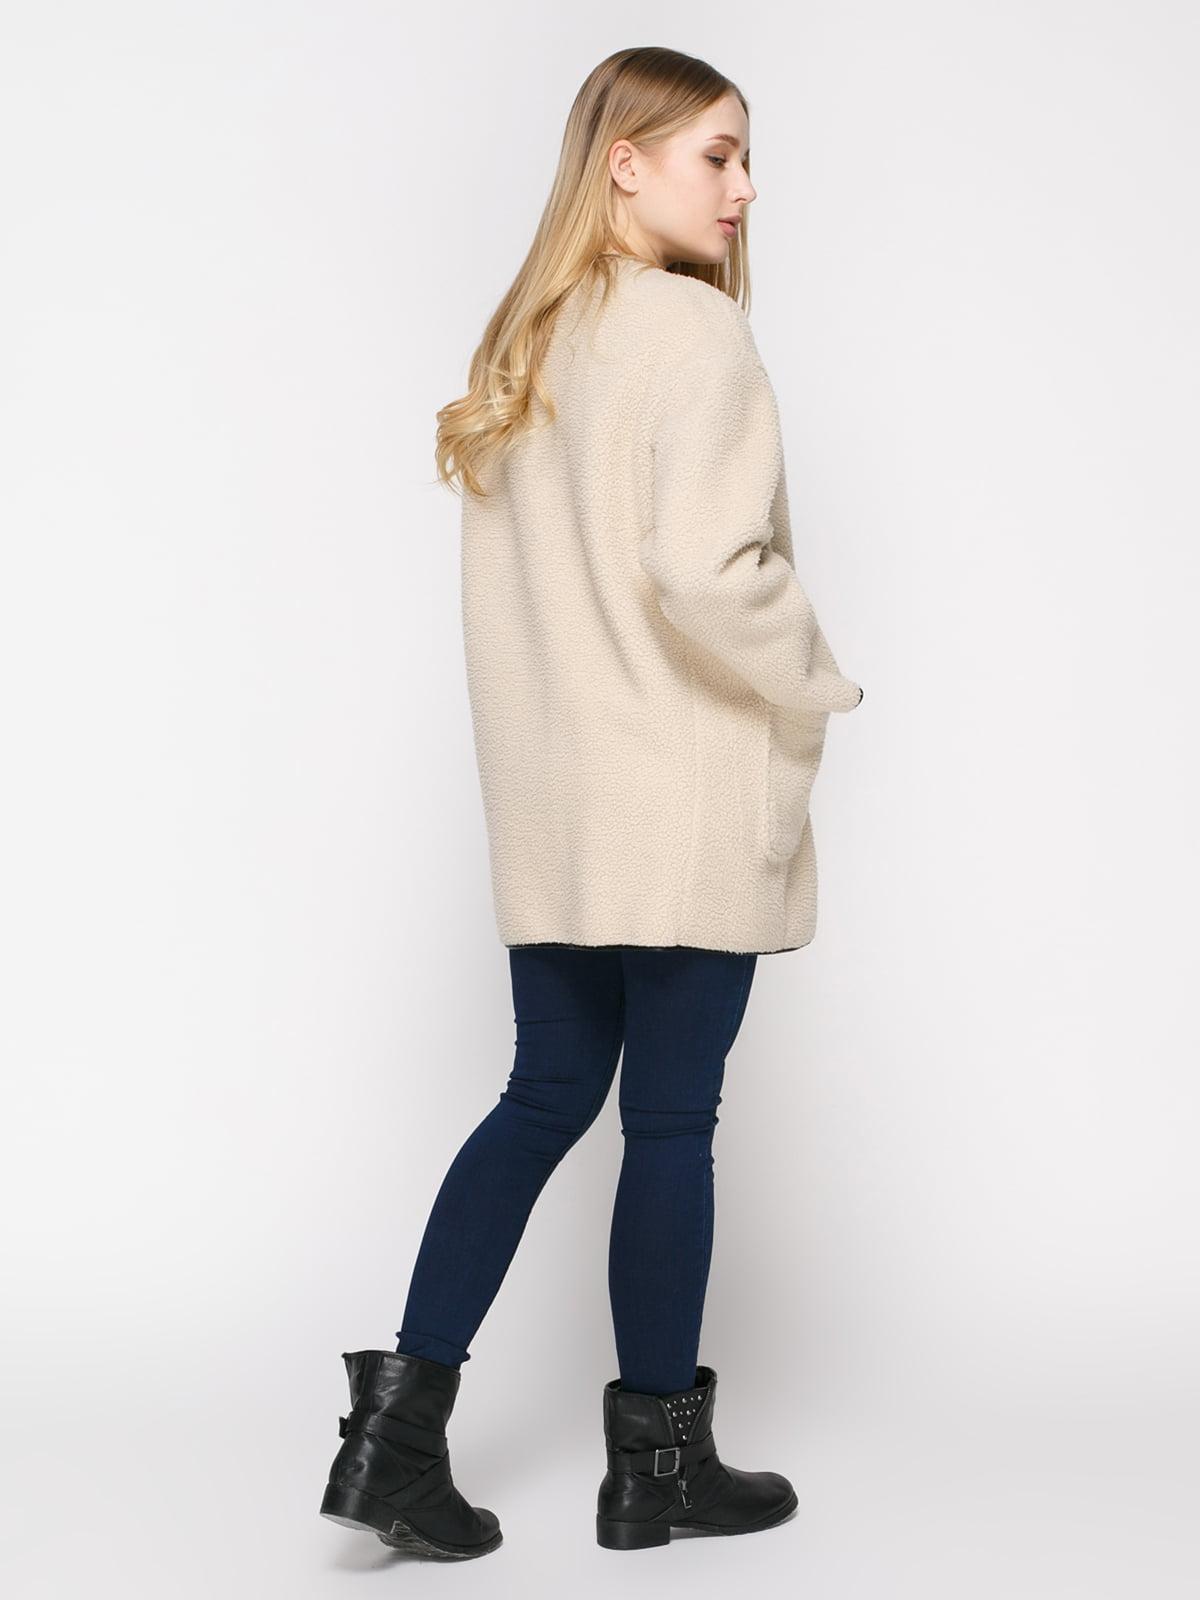 Пальто светло-бежевое | 4808022 | фото 3